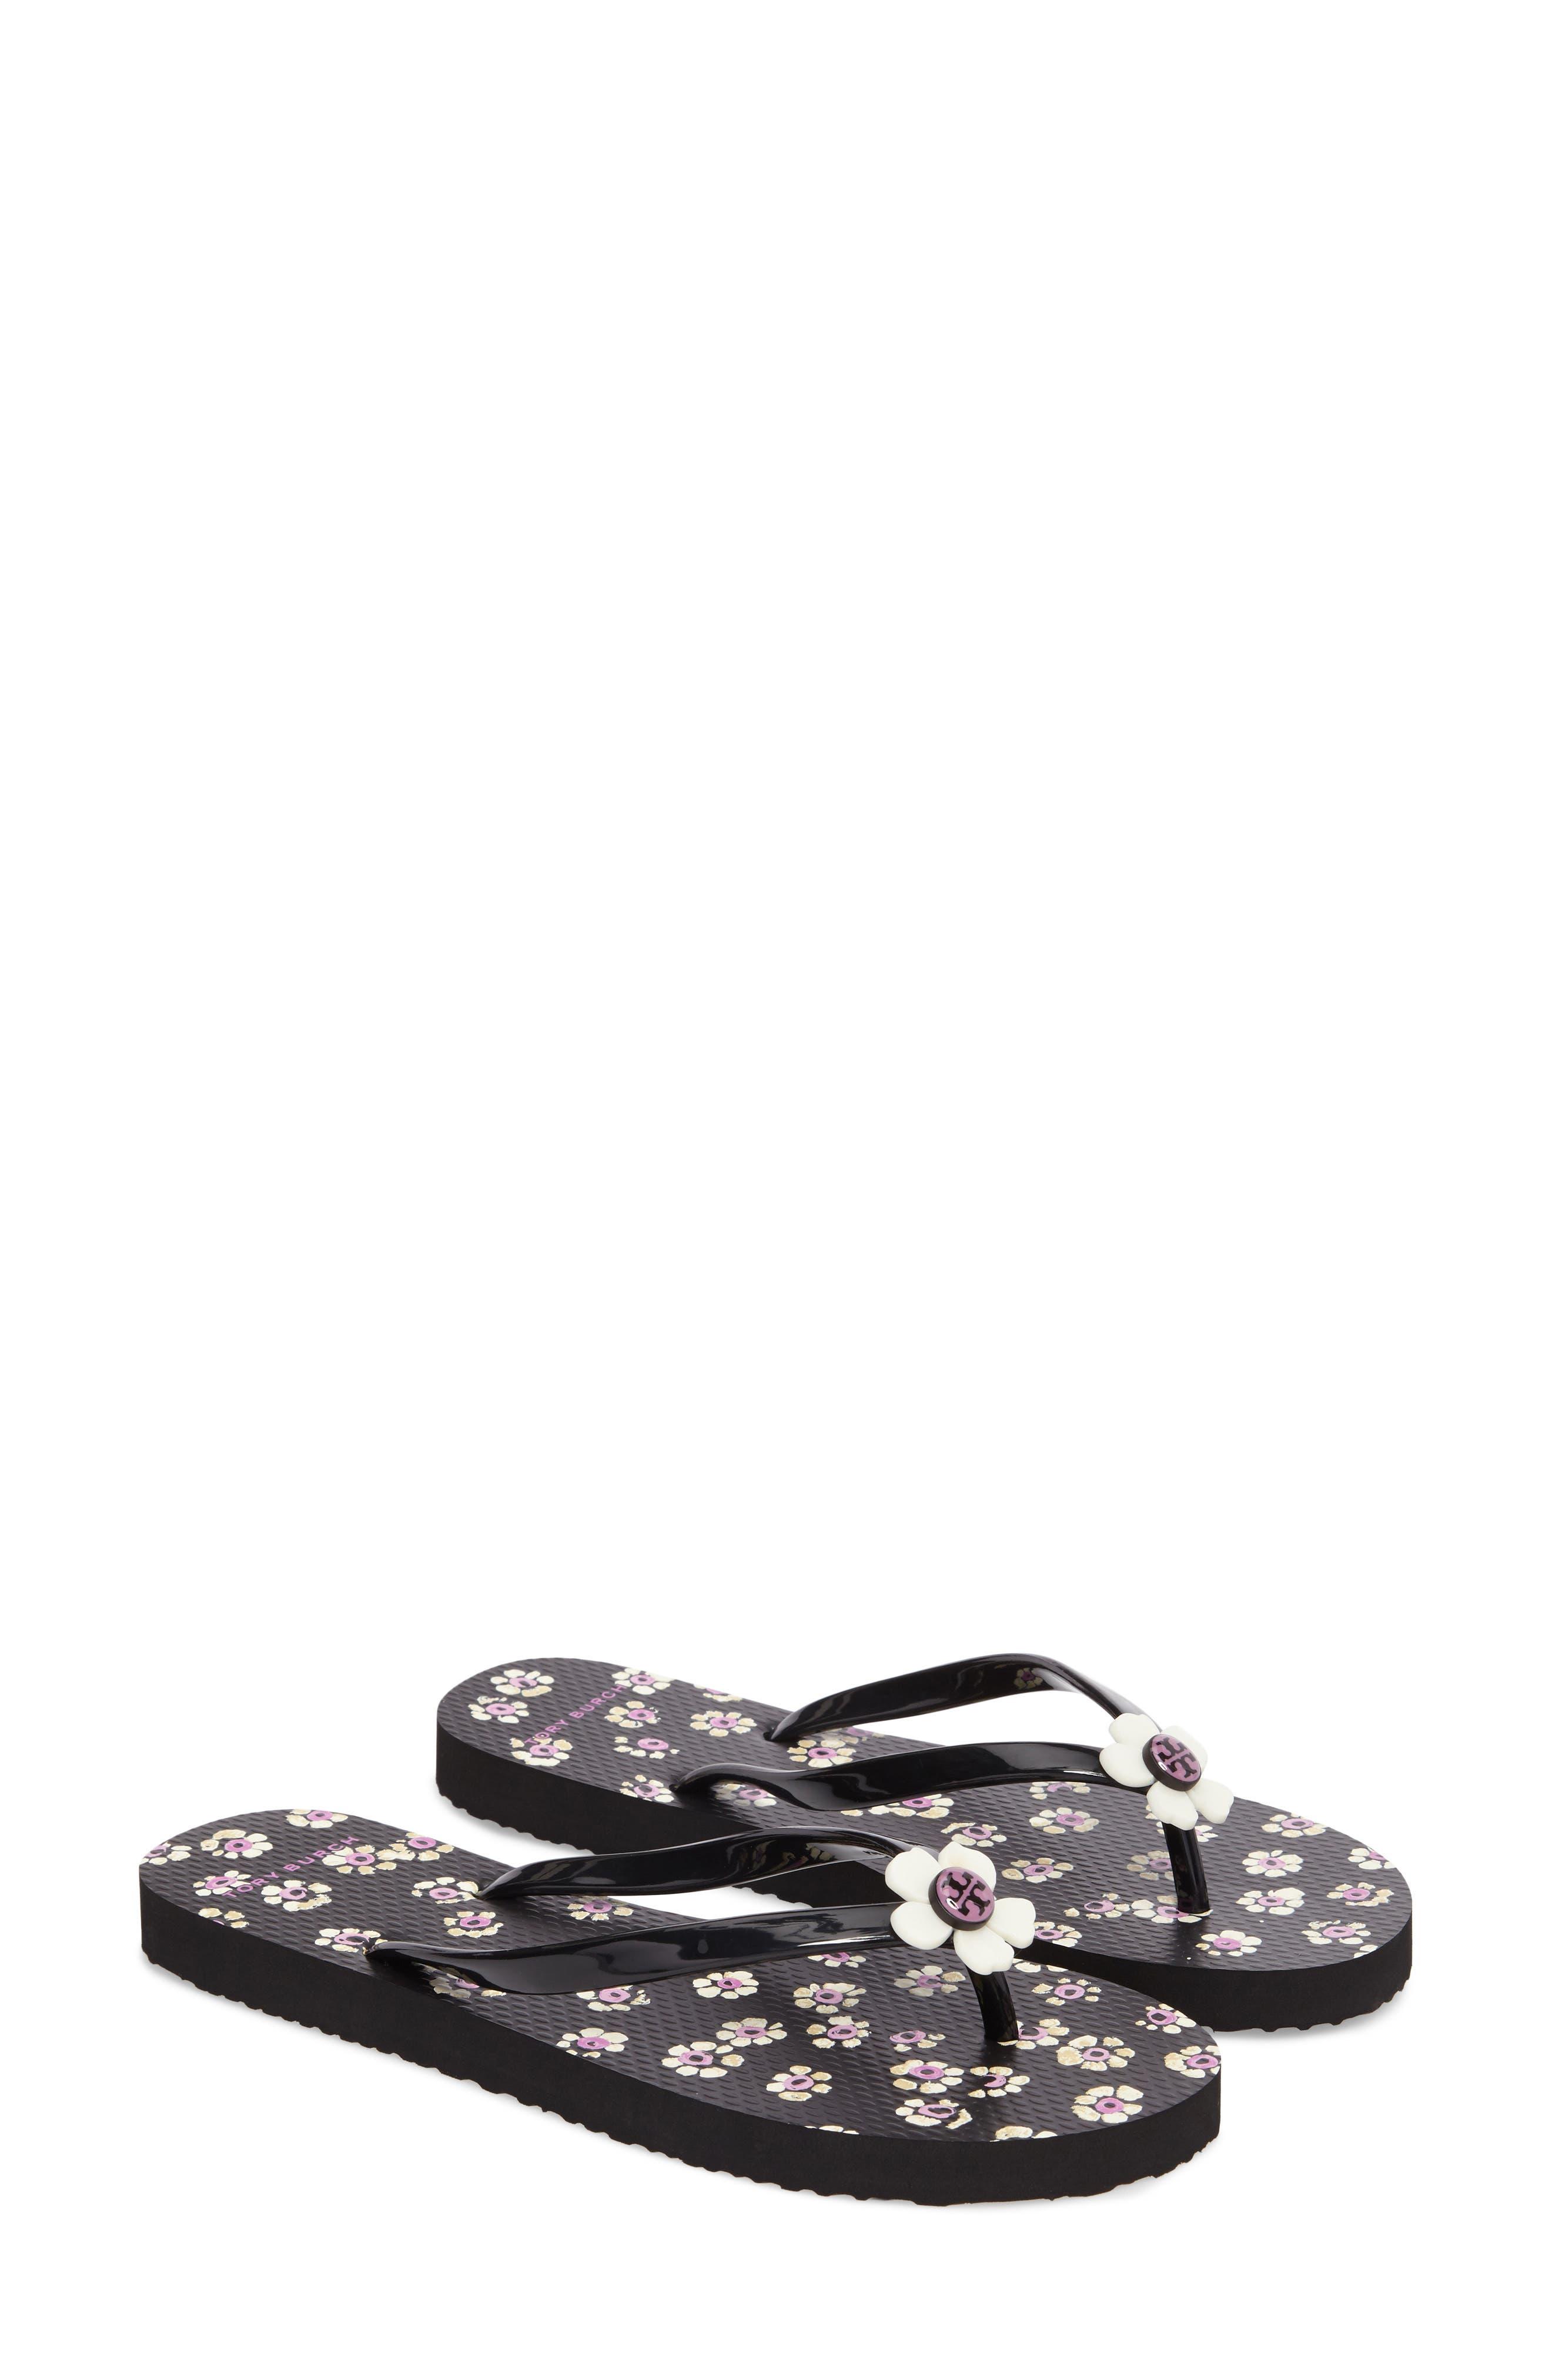 Main Image - Tory Burch Flower Flip-Flop (Women)